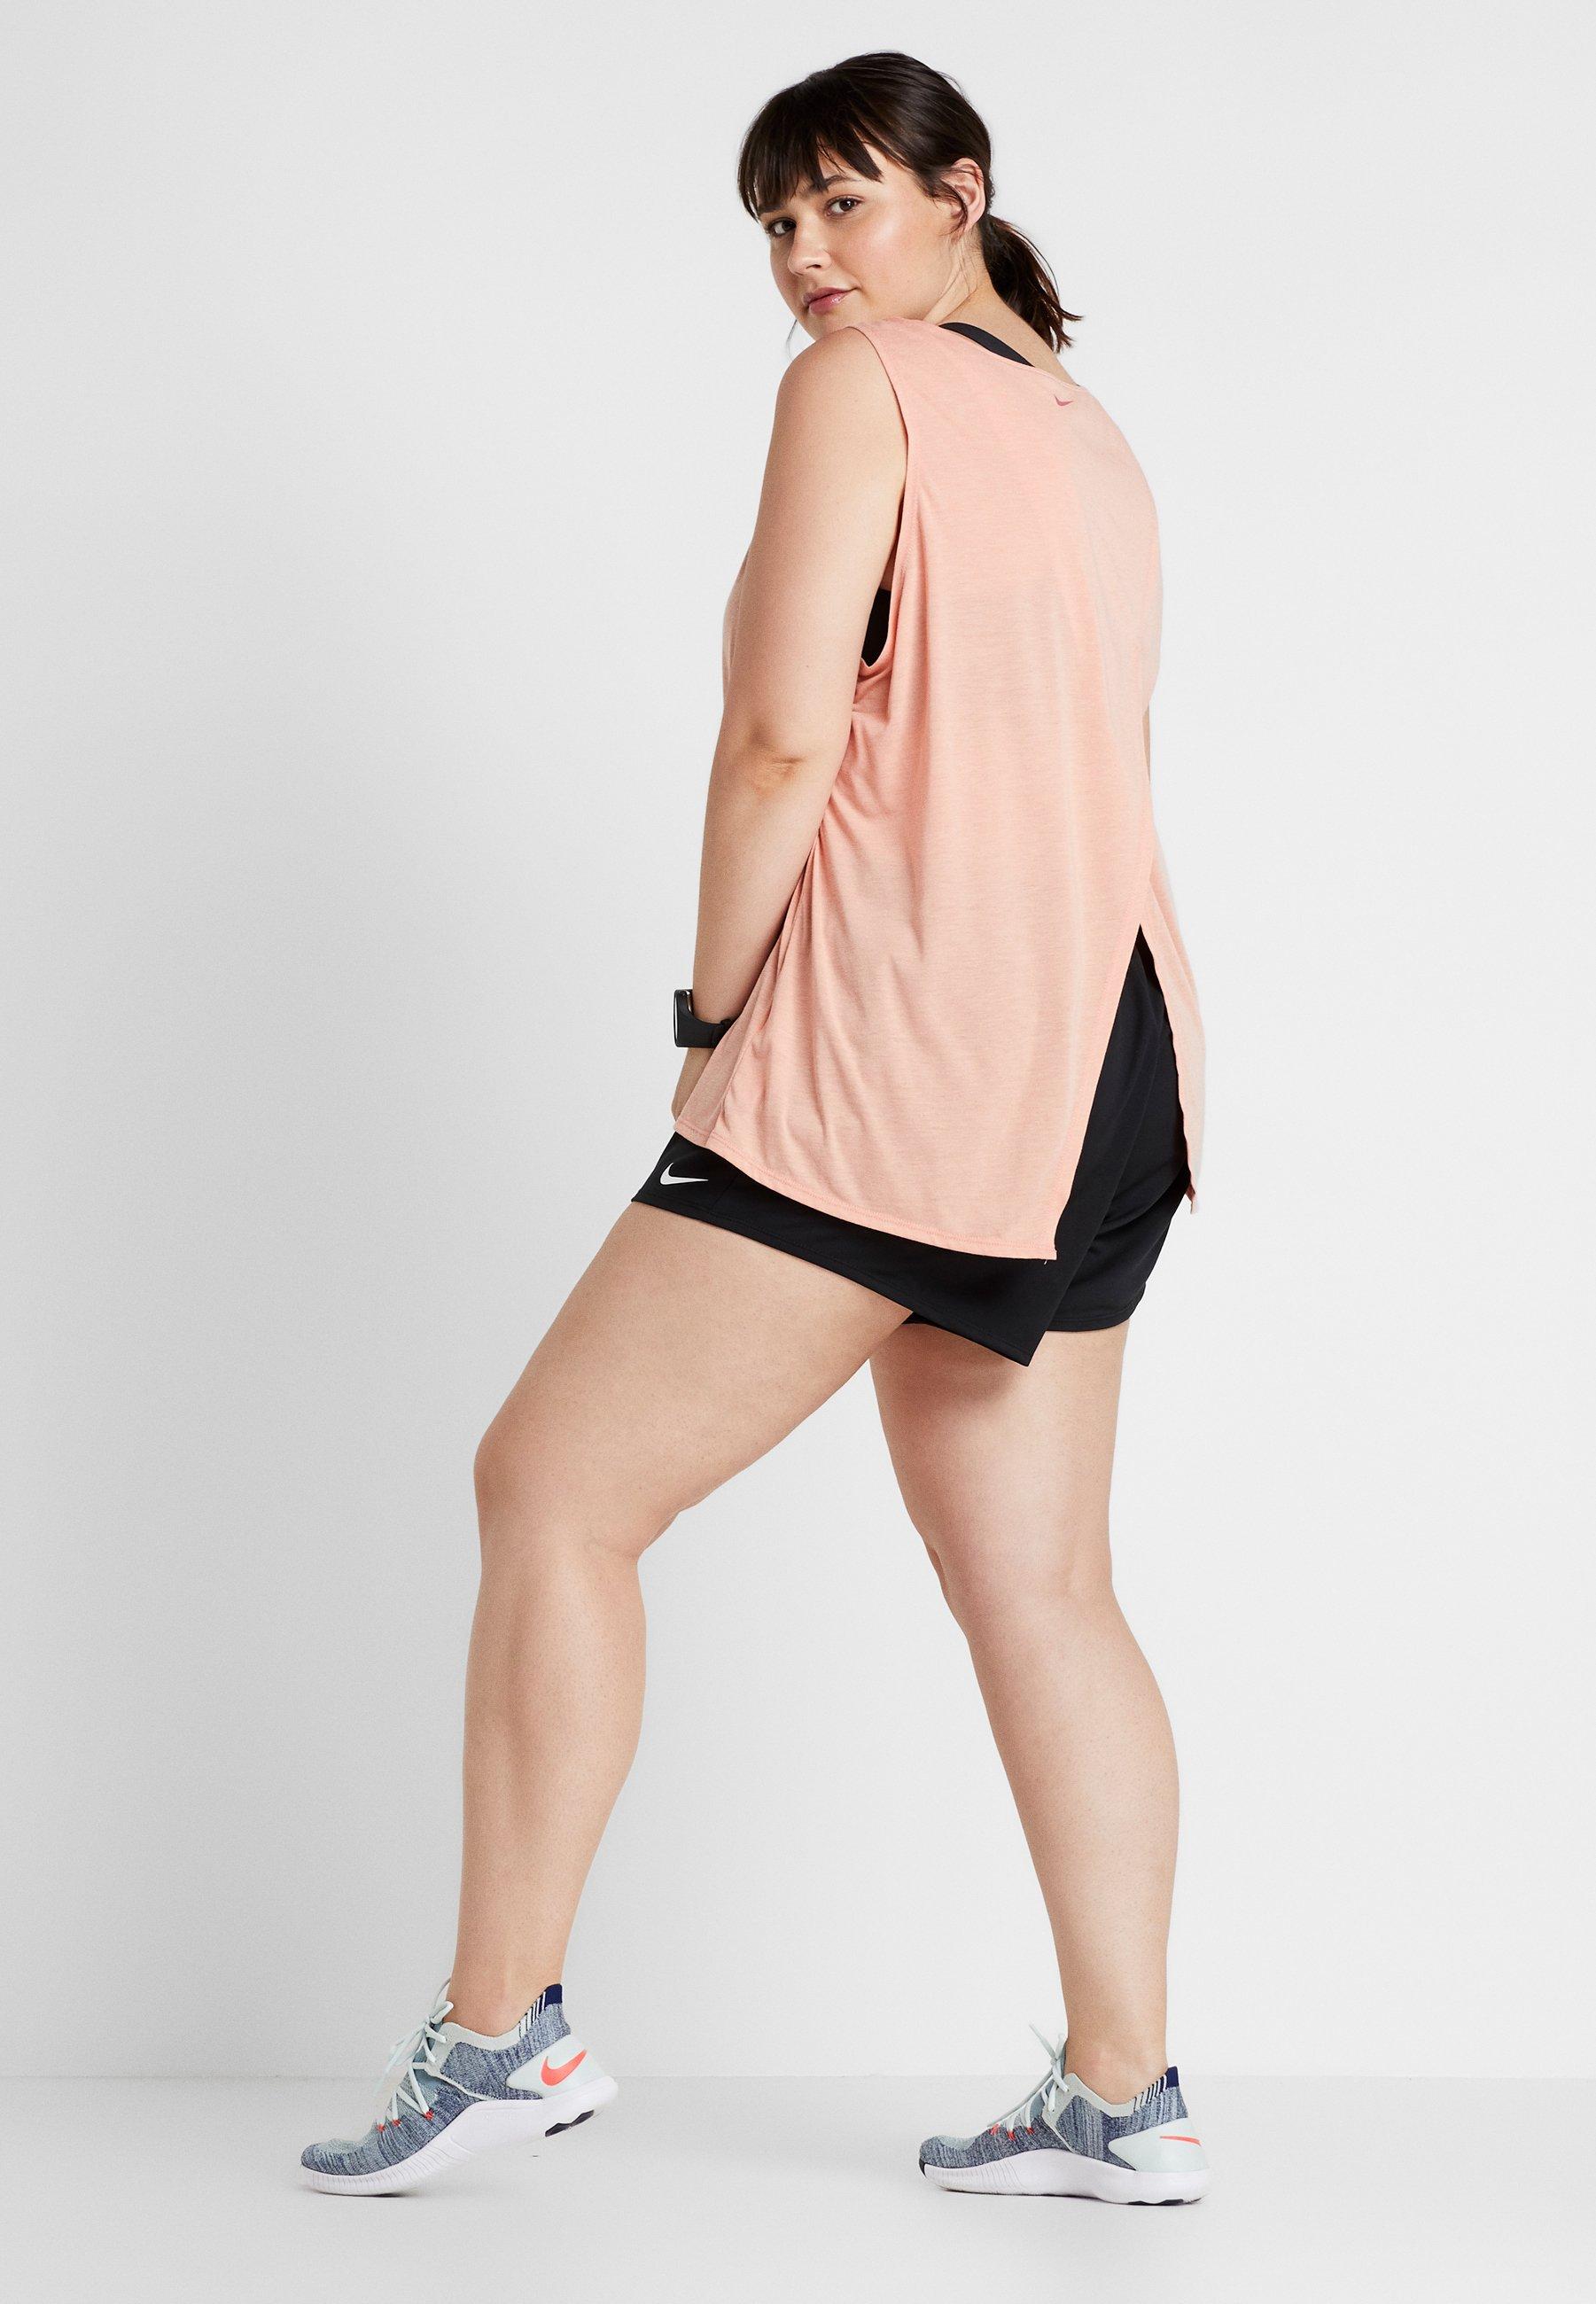 Performance Pink Sportiva light shirt heather Quartz Nike Redwood Yoga PlusT XNOZnPkw80